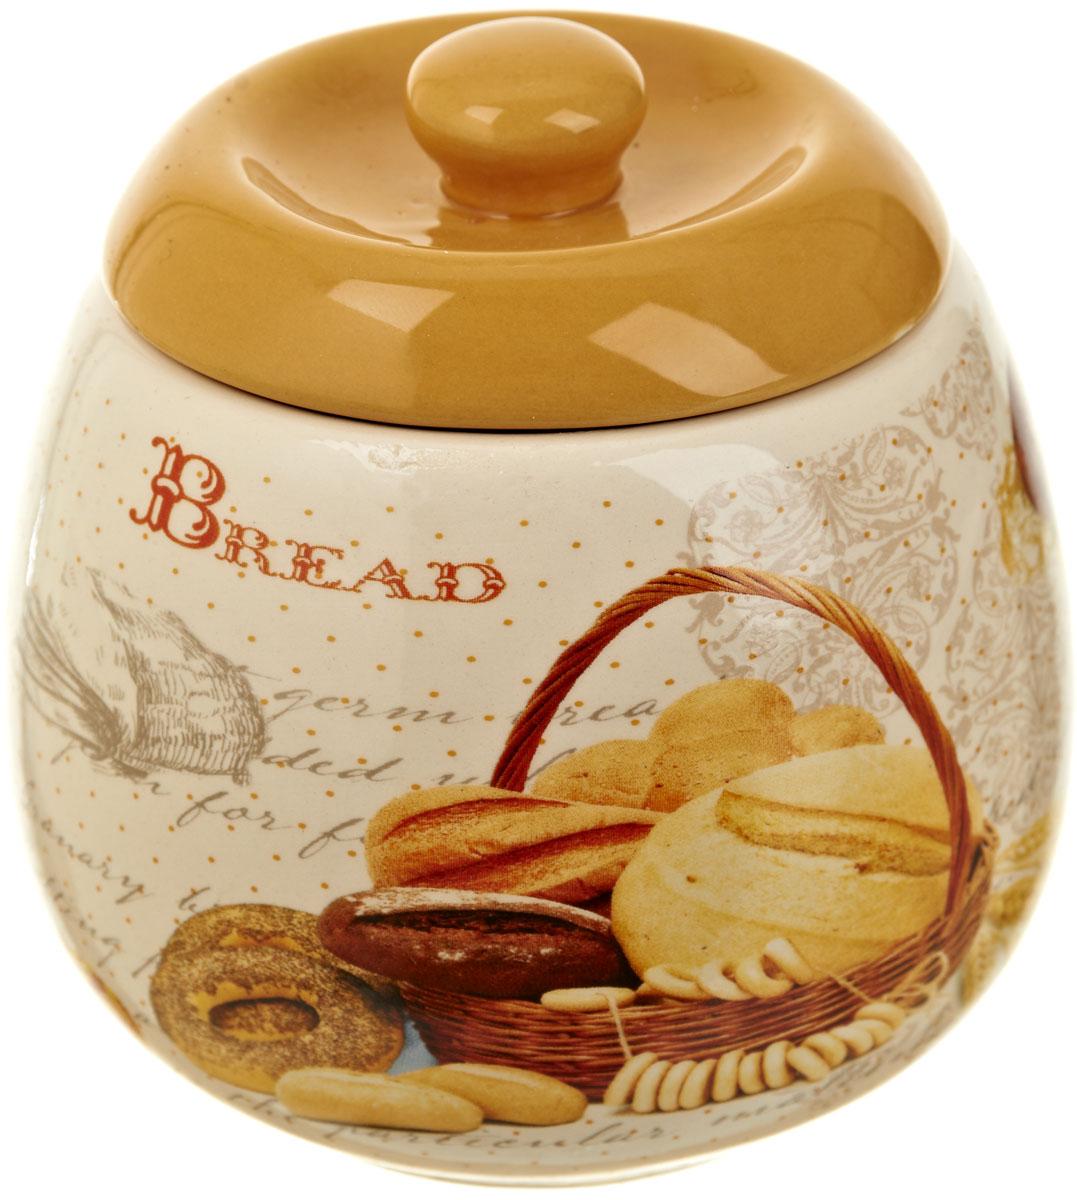 Сахарница Polystar Хлеб, 500 мл сахарница pasabahce perla 500 мл